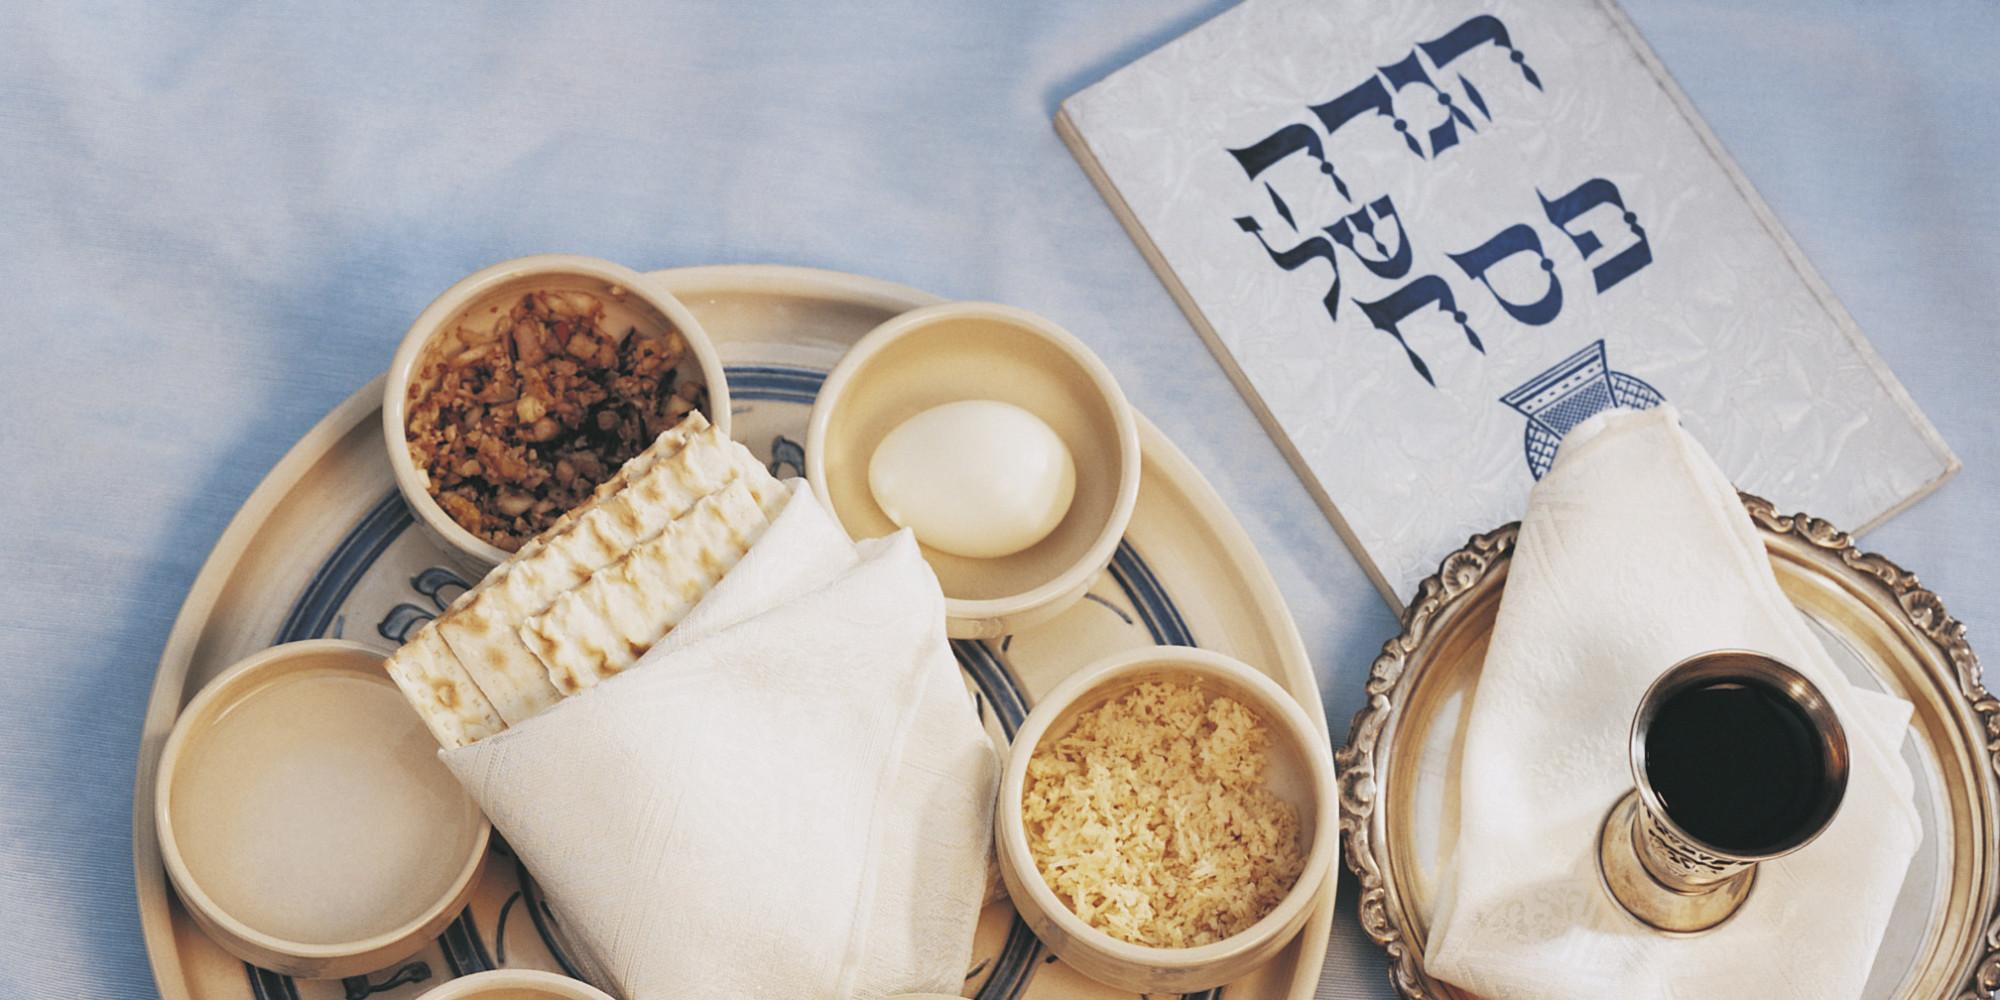 Spirituality vs Science: Is Kosher Food Safer?